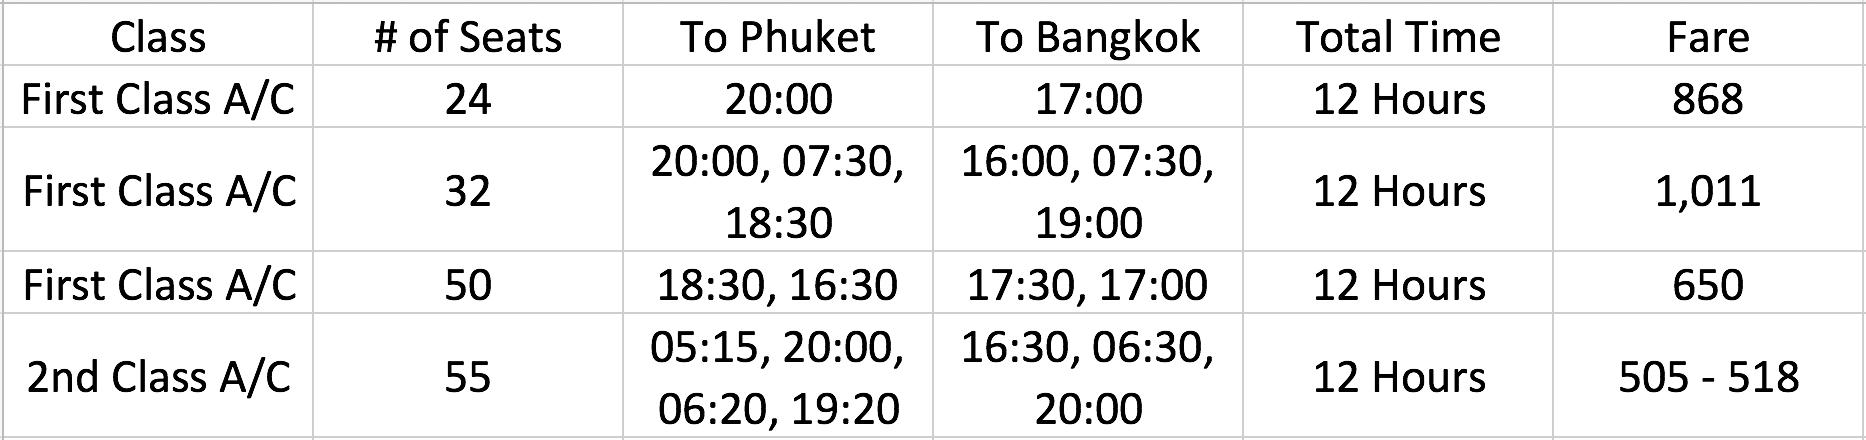 bangkok-to-phuket-by-bus.png